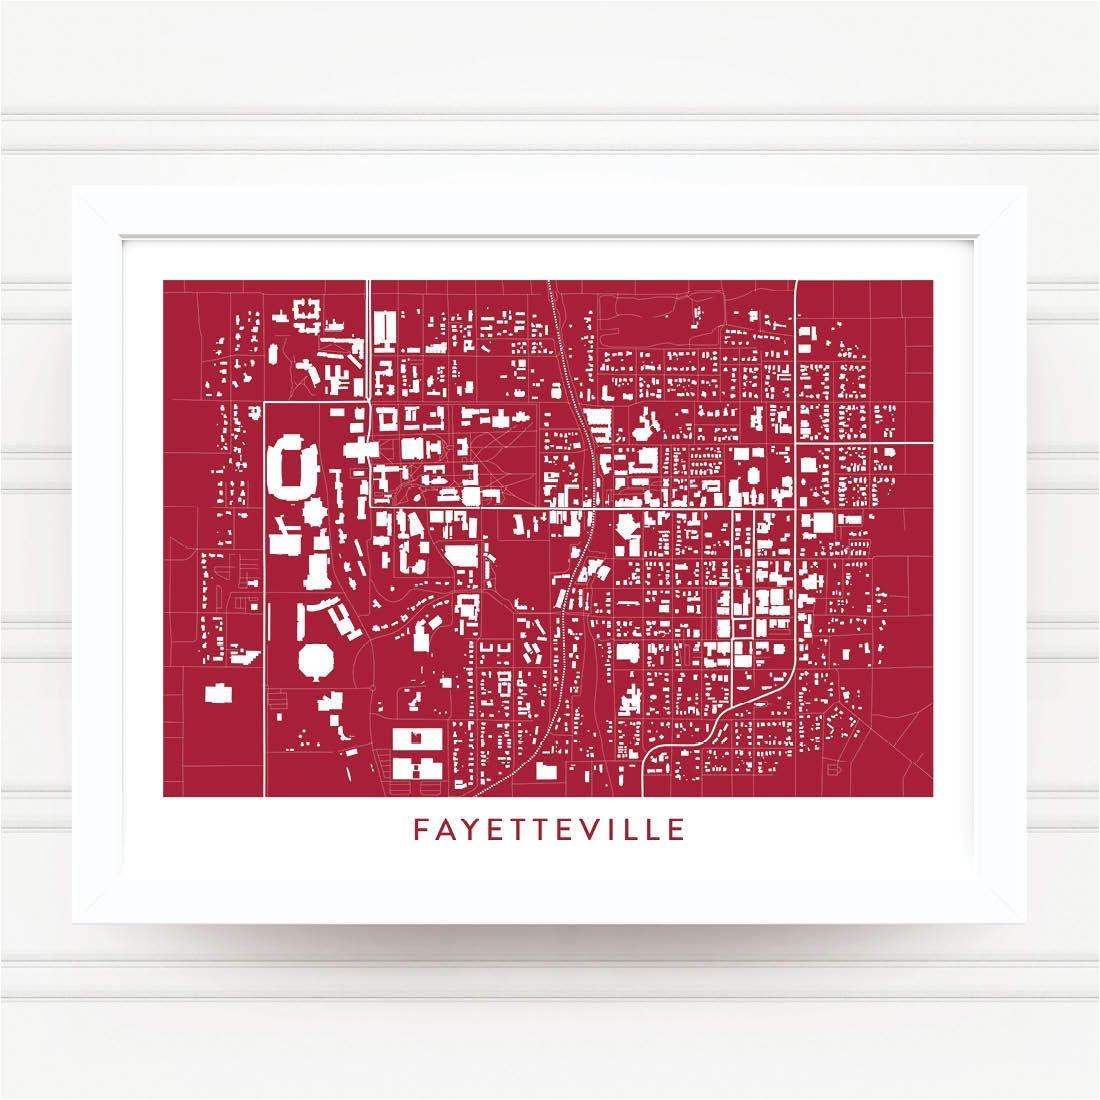 fayetteville arkansas map print home decor office decor art poster wall